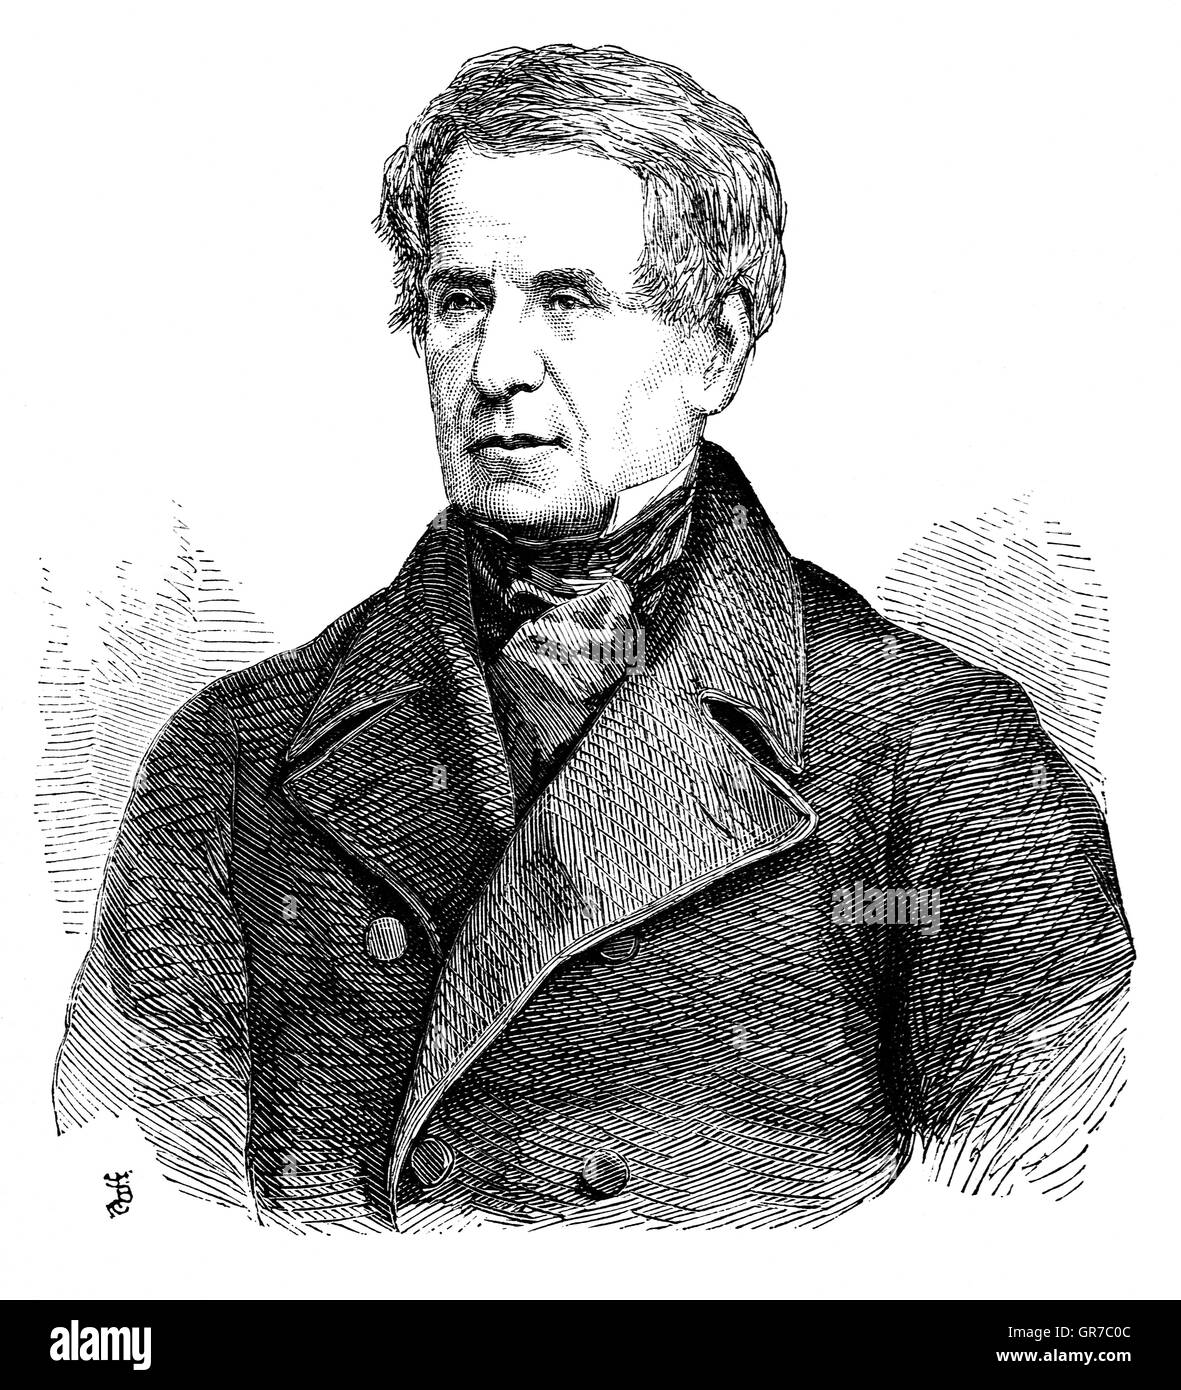 Richard Bickerton Pemell Lyons, 1st Viscount Lyons (1817 – 1887) was an eminent British diplomat. In December 1858, - Stock Image